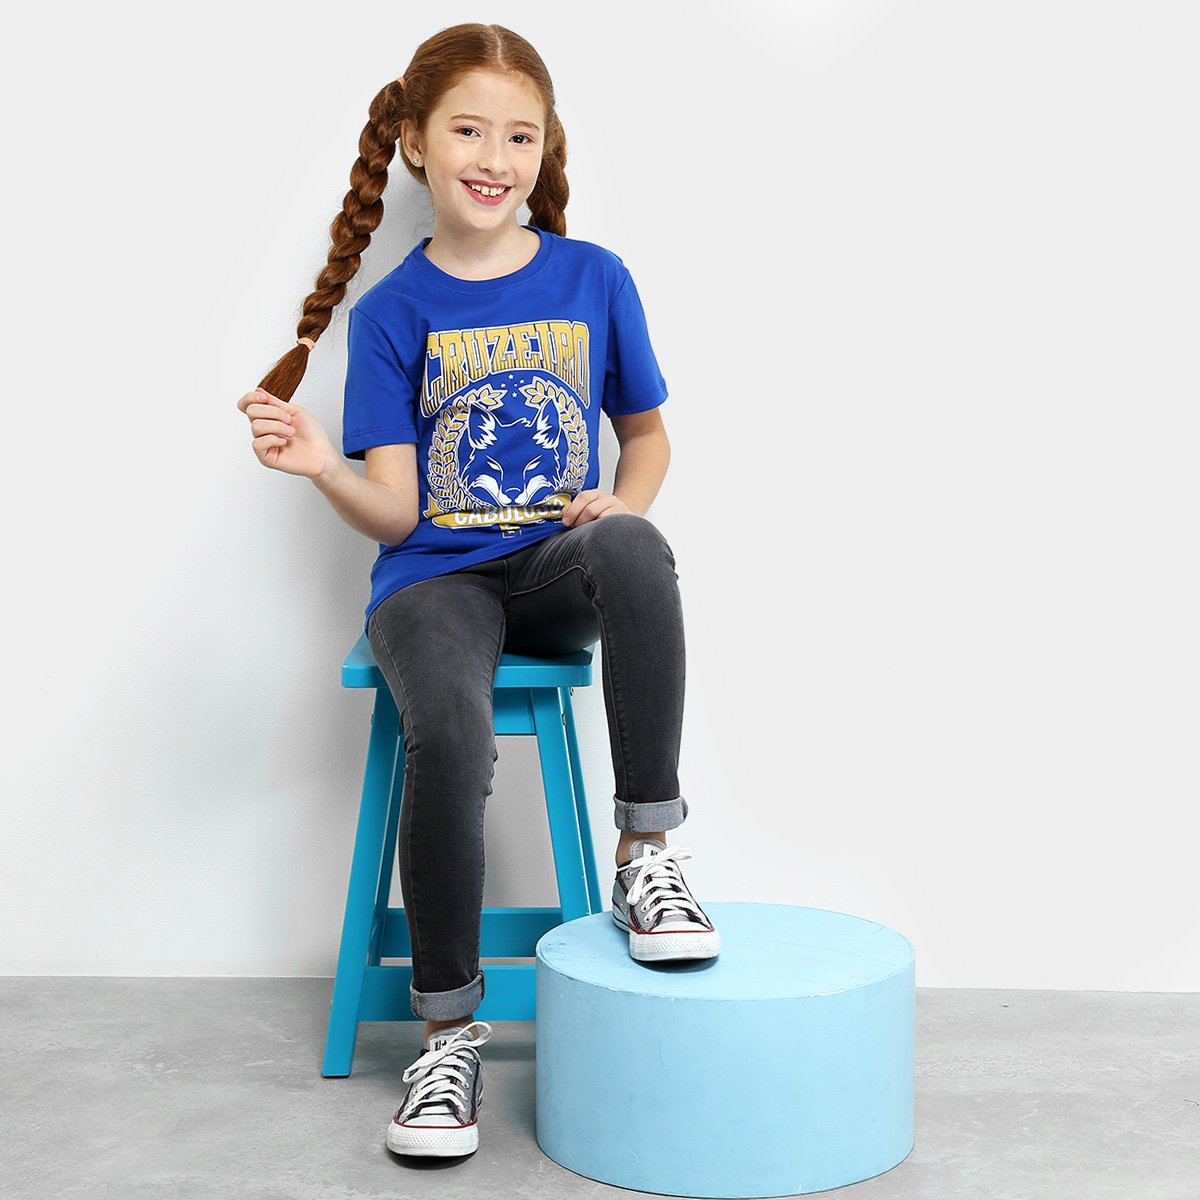 b4df877698 Cruzeiro Cruzeiro Camiseta Azul Infantil Camiseta Infantil Camiseta Infantil  Azul Azul Cabuloso Cruzeiro Cabuloso Cabuloso qYt81Cw ...